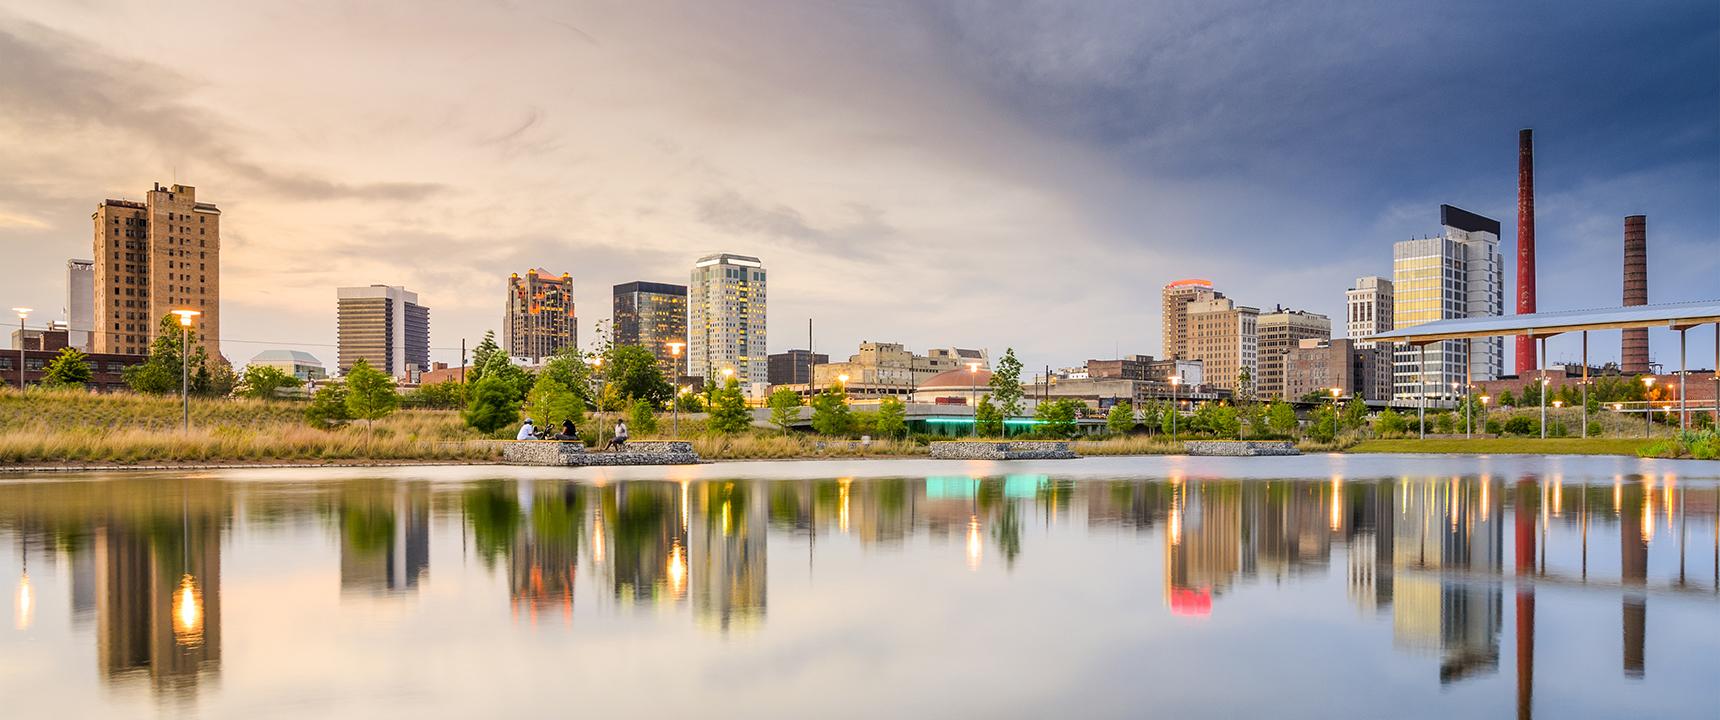 Photo of Birmingham, Alabama where the Principal Financial Network of Alabama is located.